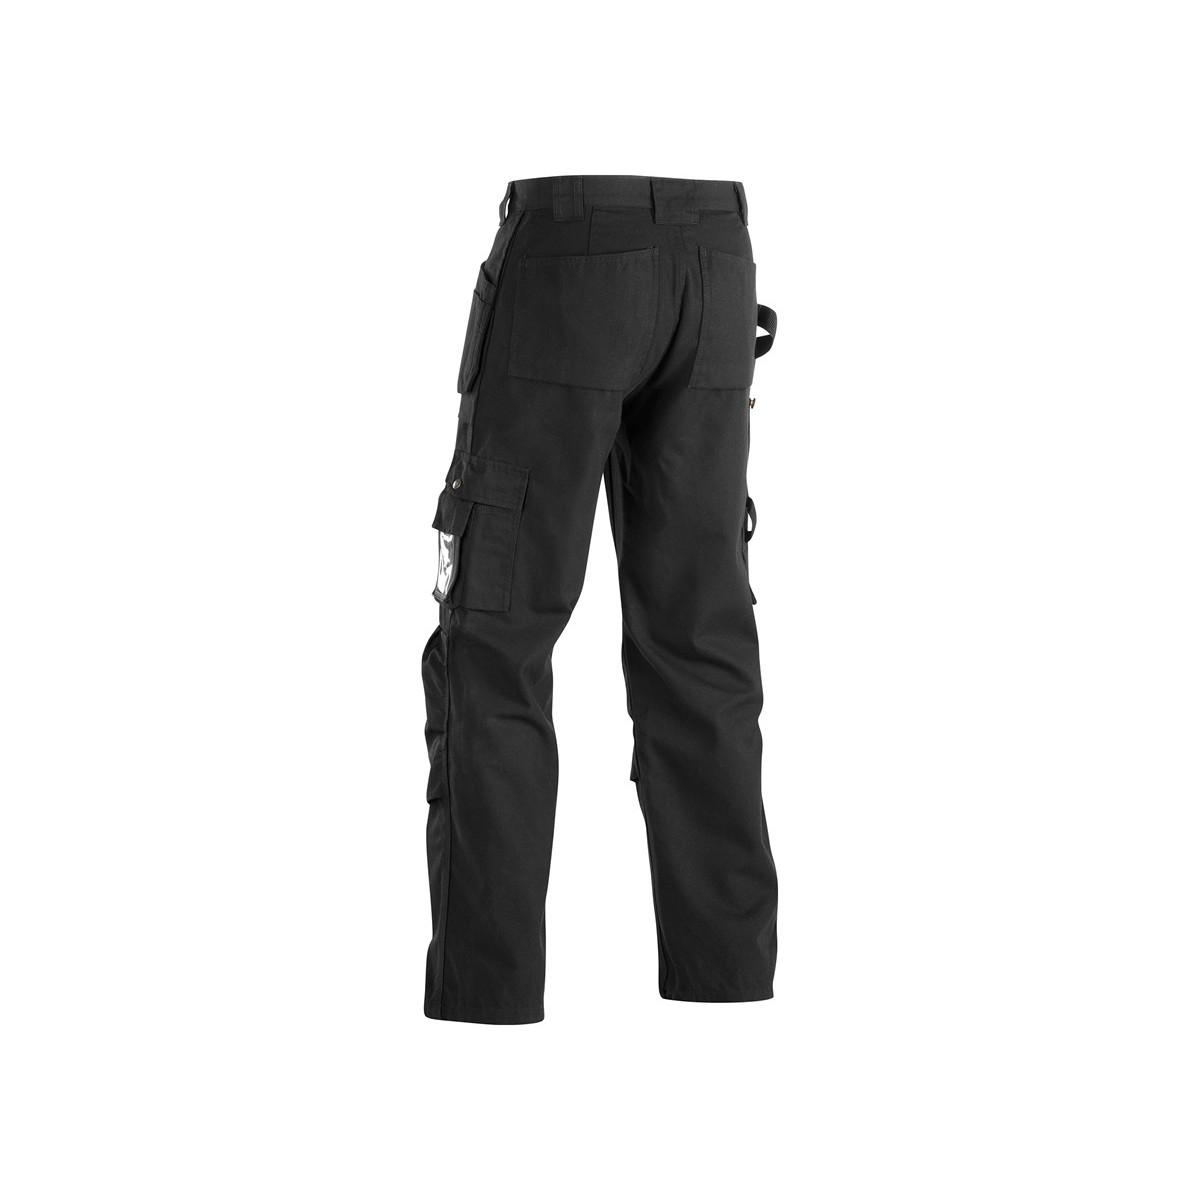 pantalon de travail artisan poches libres noir. Black Bedroom Furniture Sets. Home Design Ideas